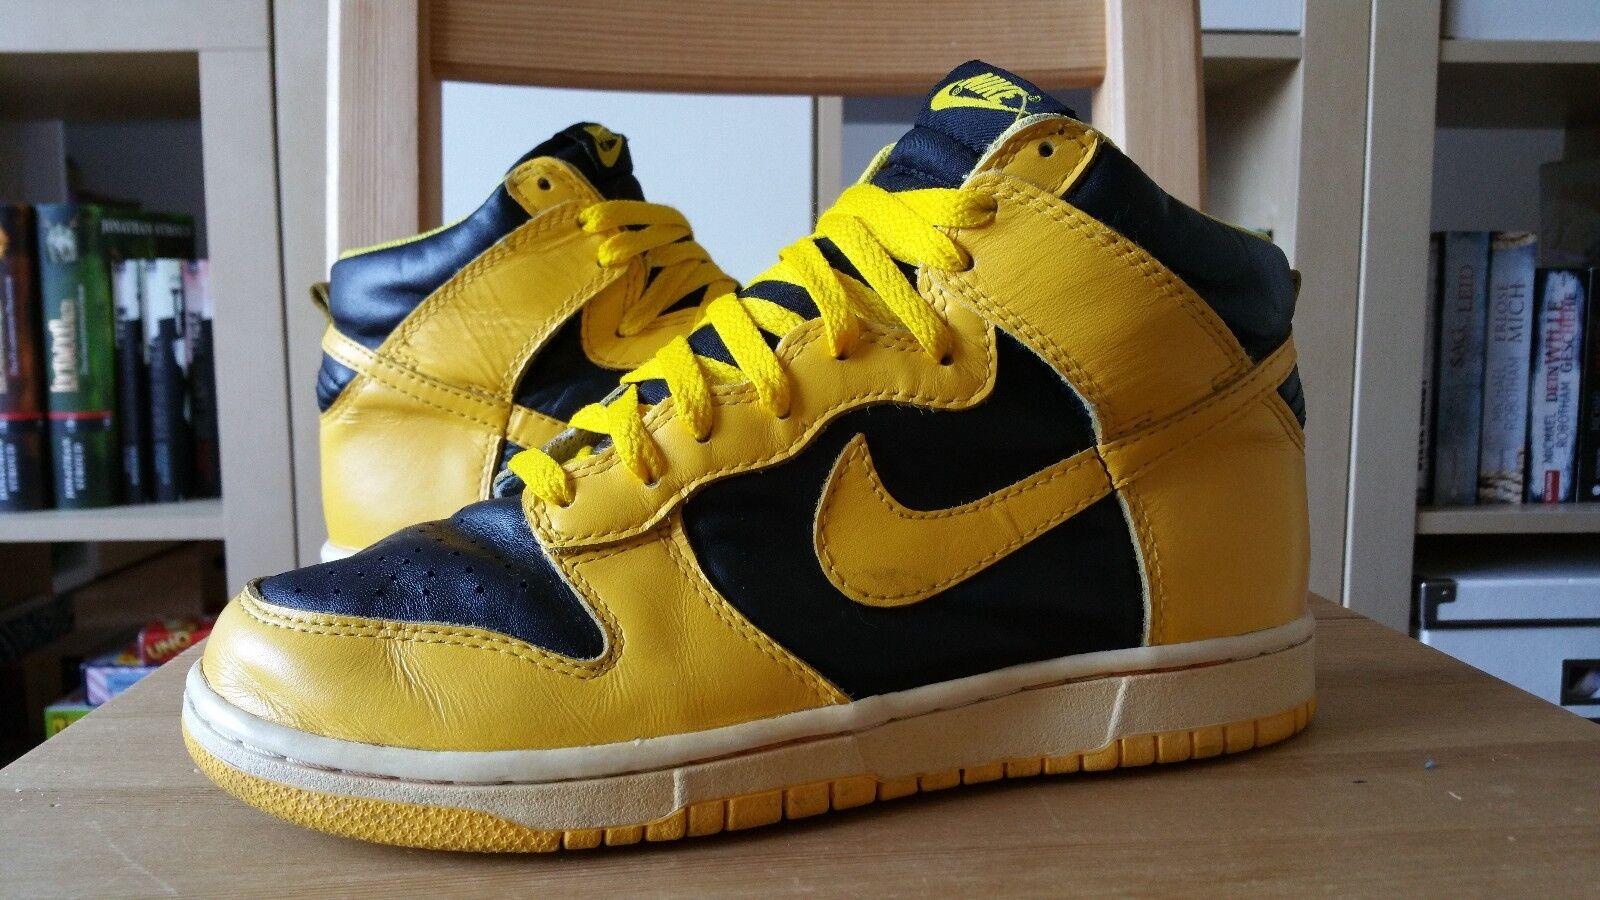 Nike Dunk BTTYS 2007 Yellow gelb Hi 40 6 7 Schuhe Wu Tang Shoes SB Jordan RARE